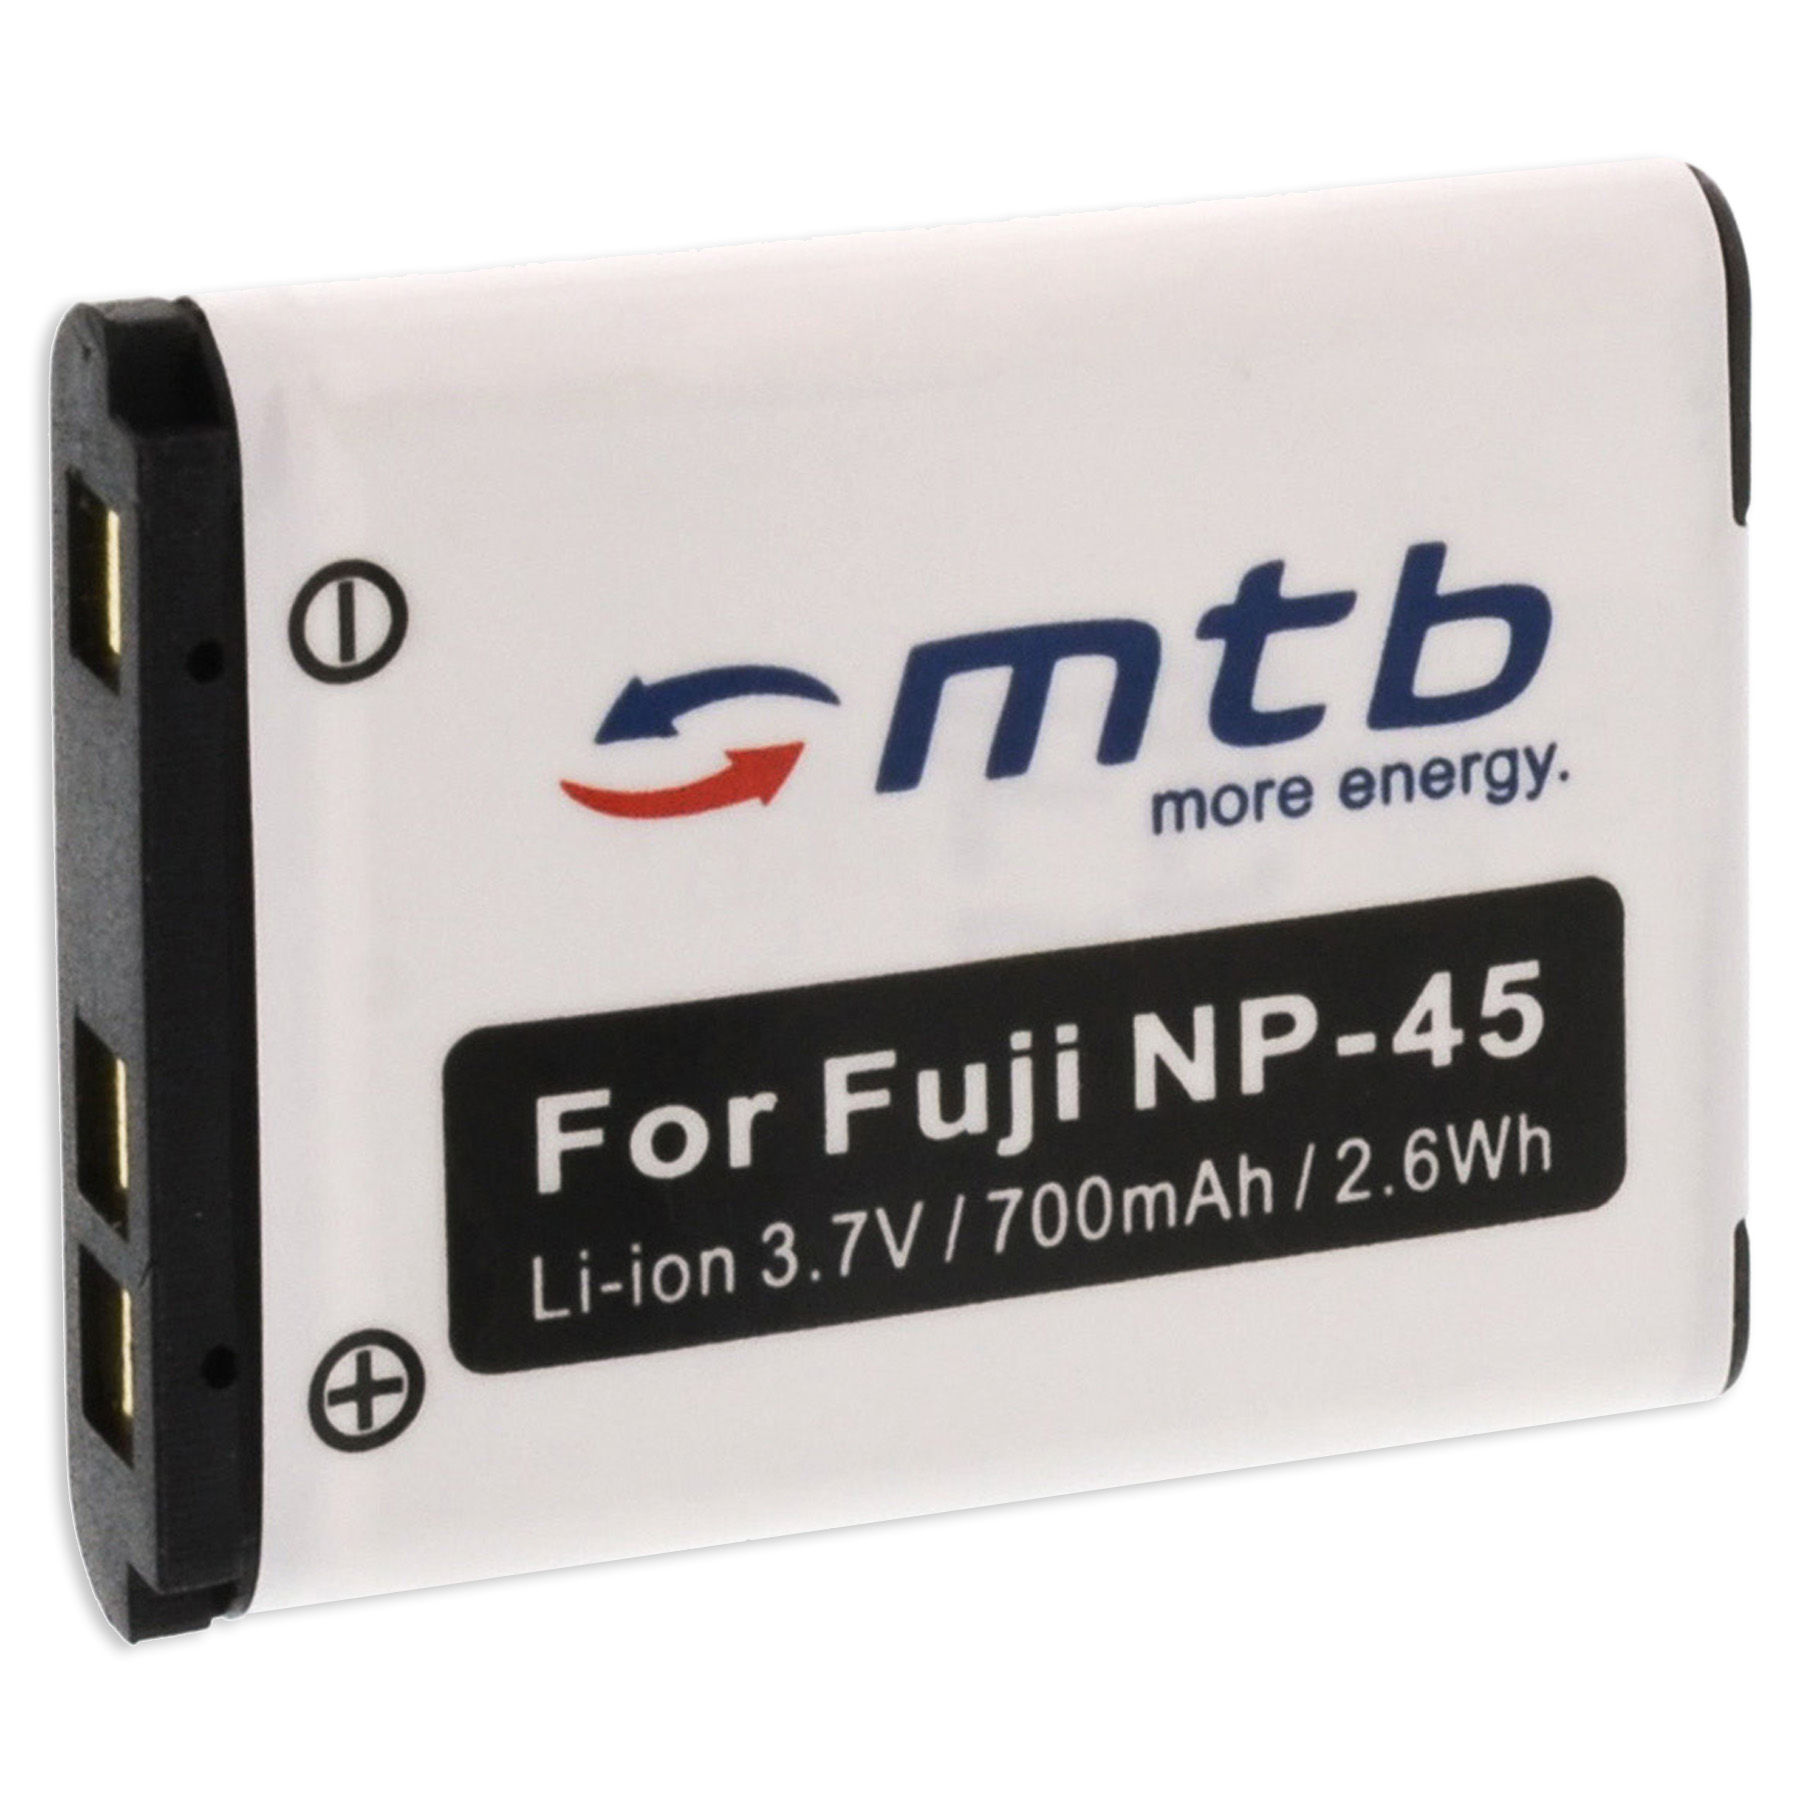 Ex-Pro Reemplazo Batería NP-45 NP45 para cámaras Fuji Finepix